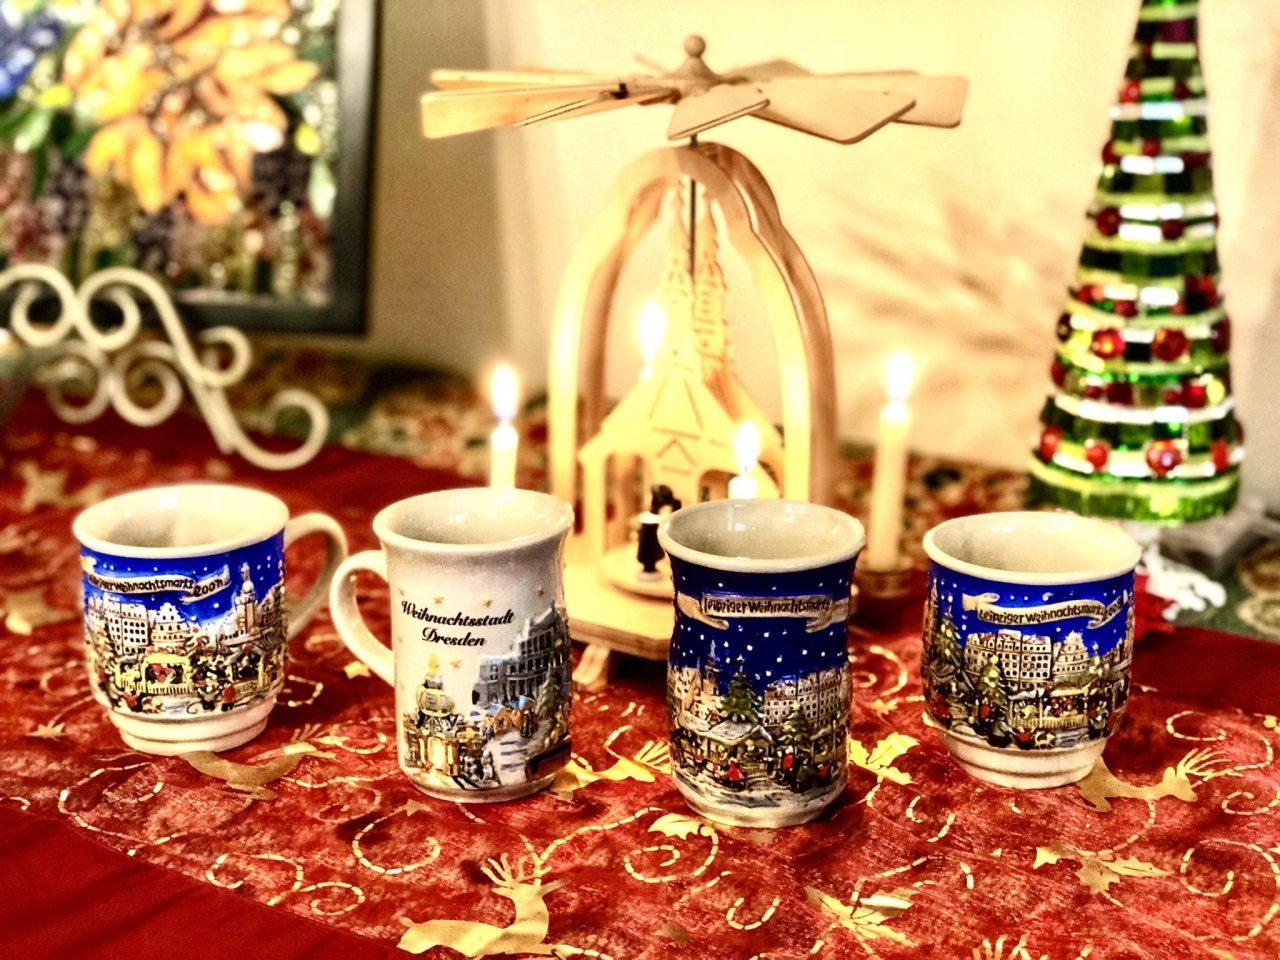 German Gluehwein mugs, Glühwein, Christmas mugs